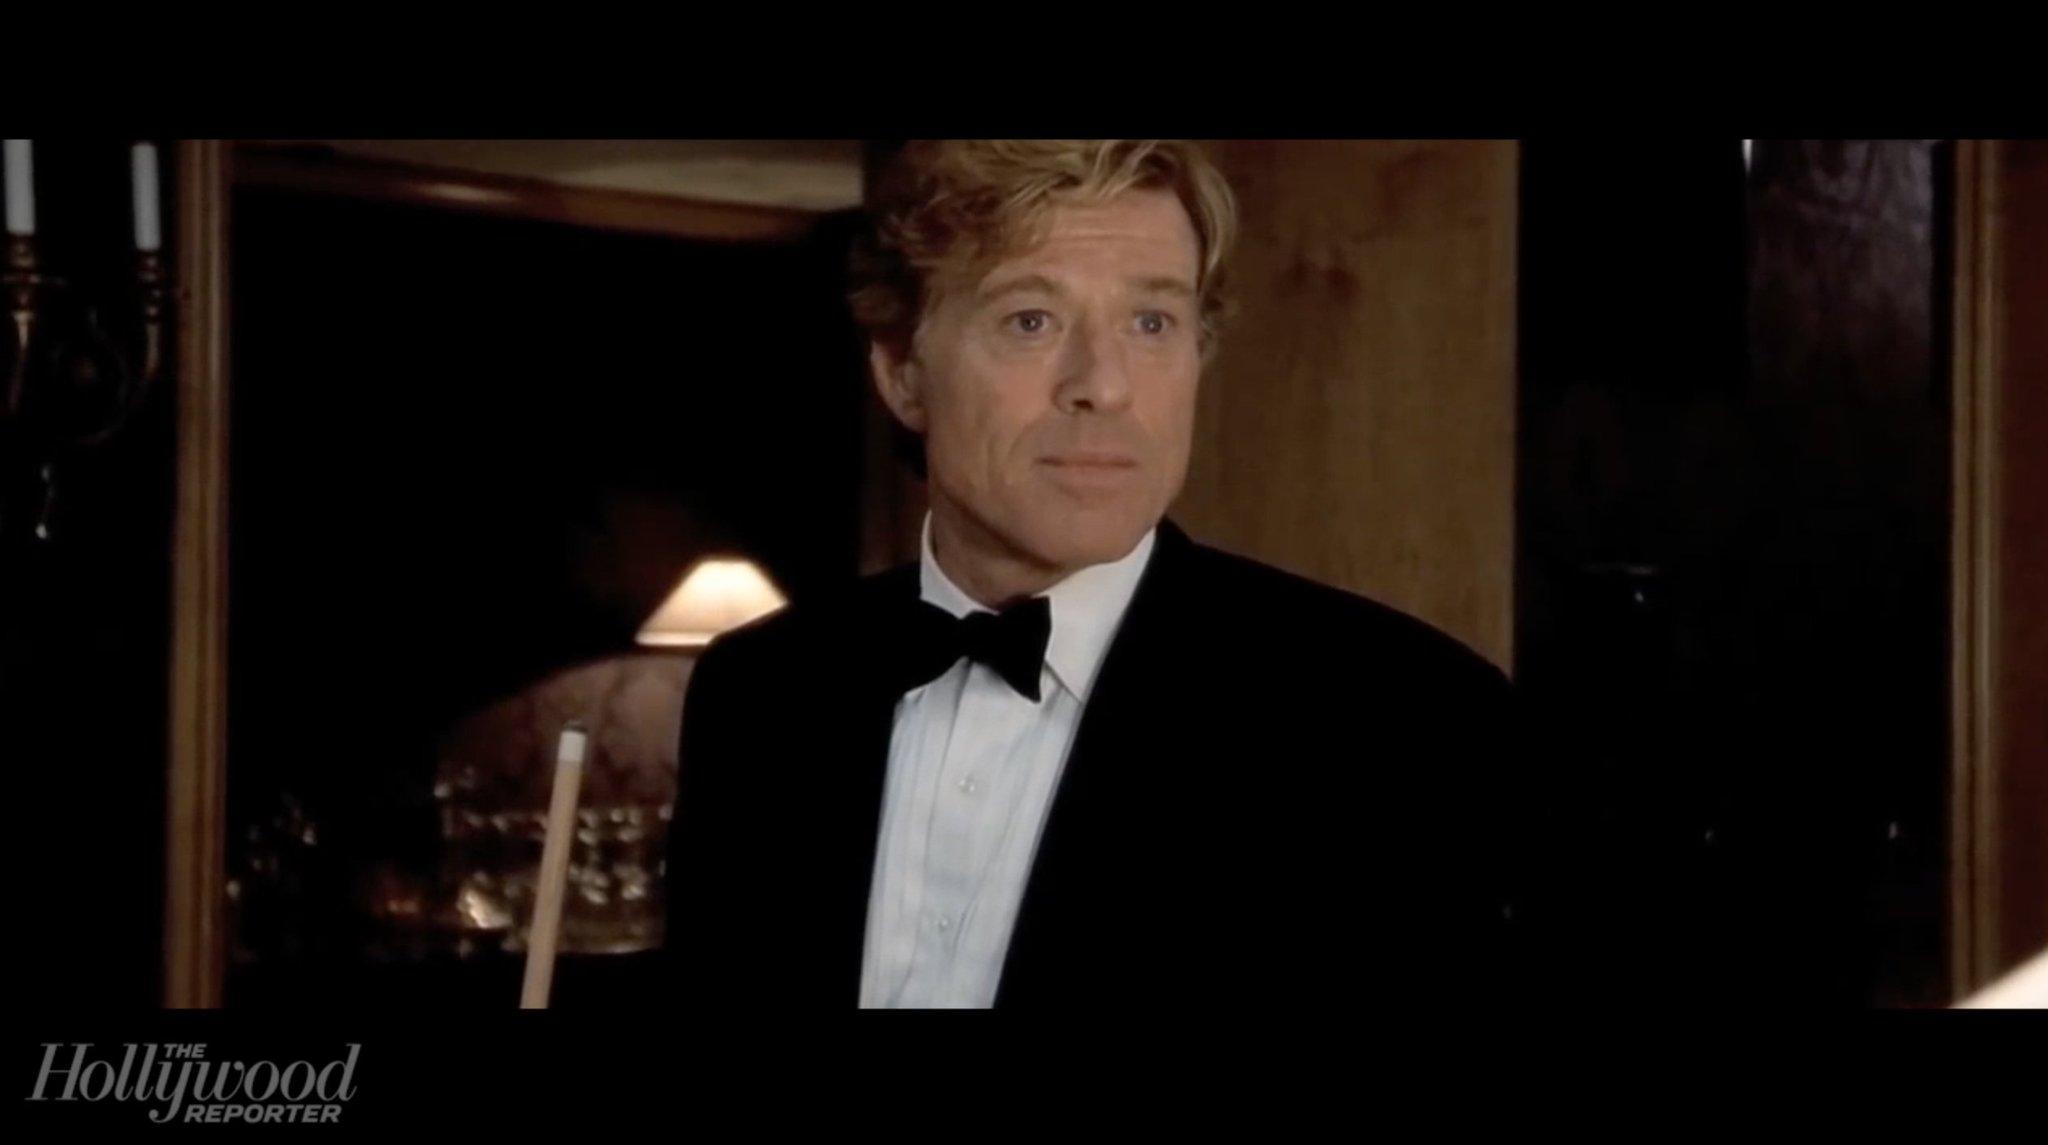 Oscar-winner Robert Redford turns 81 today. https://t.co/kY4ILjorIg